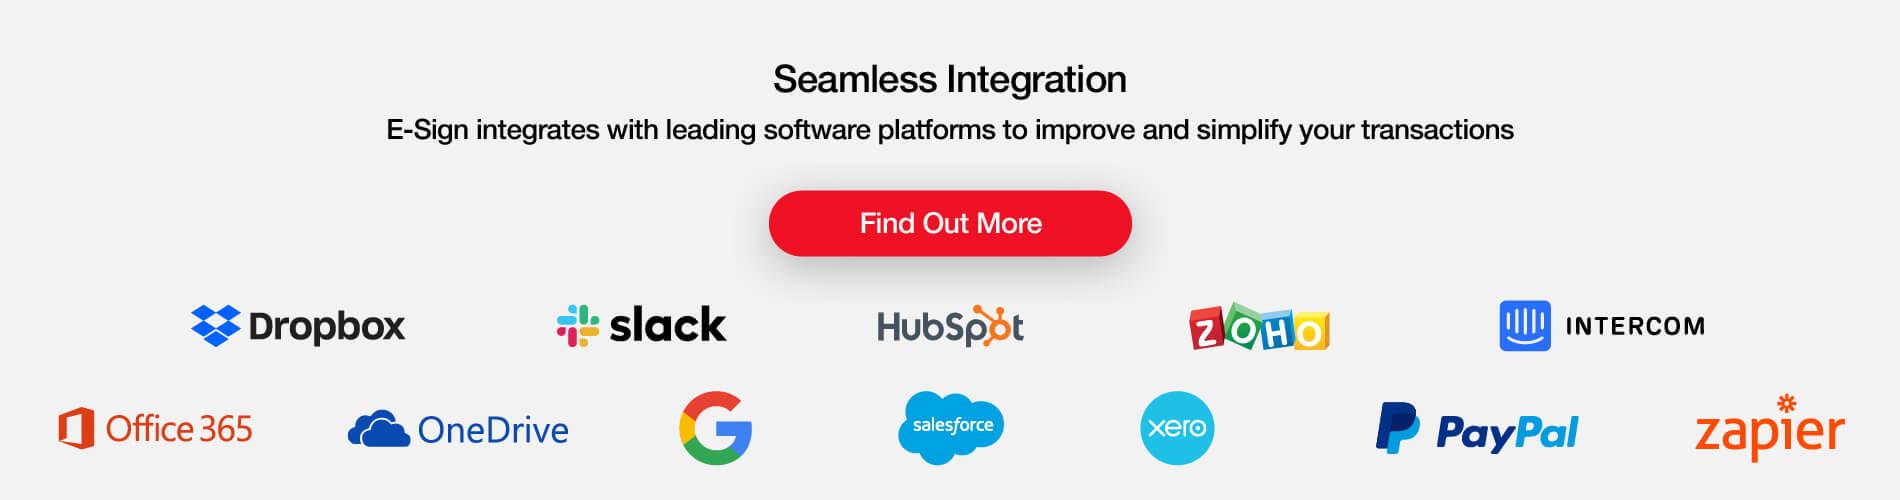 E-Sign seamless integration